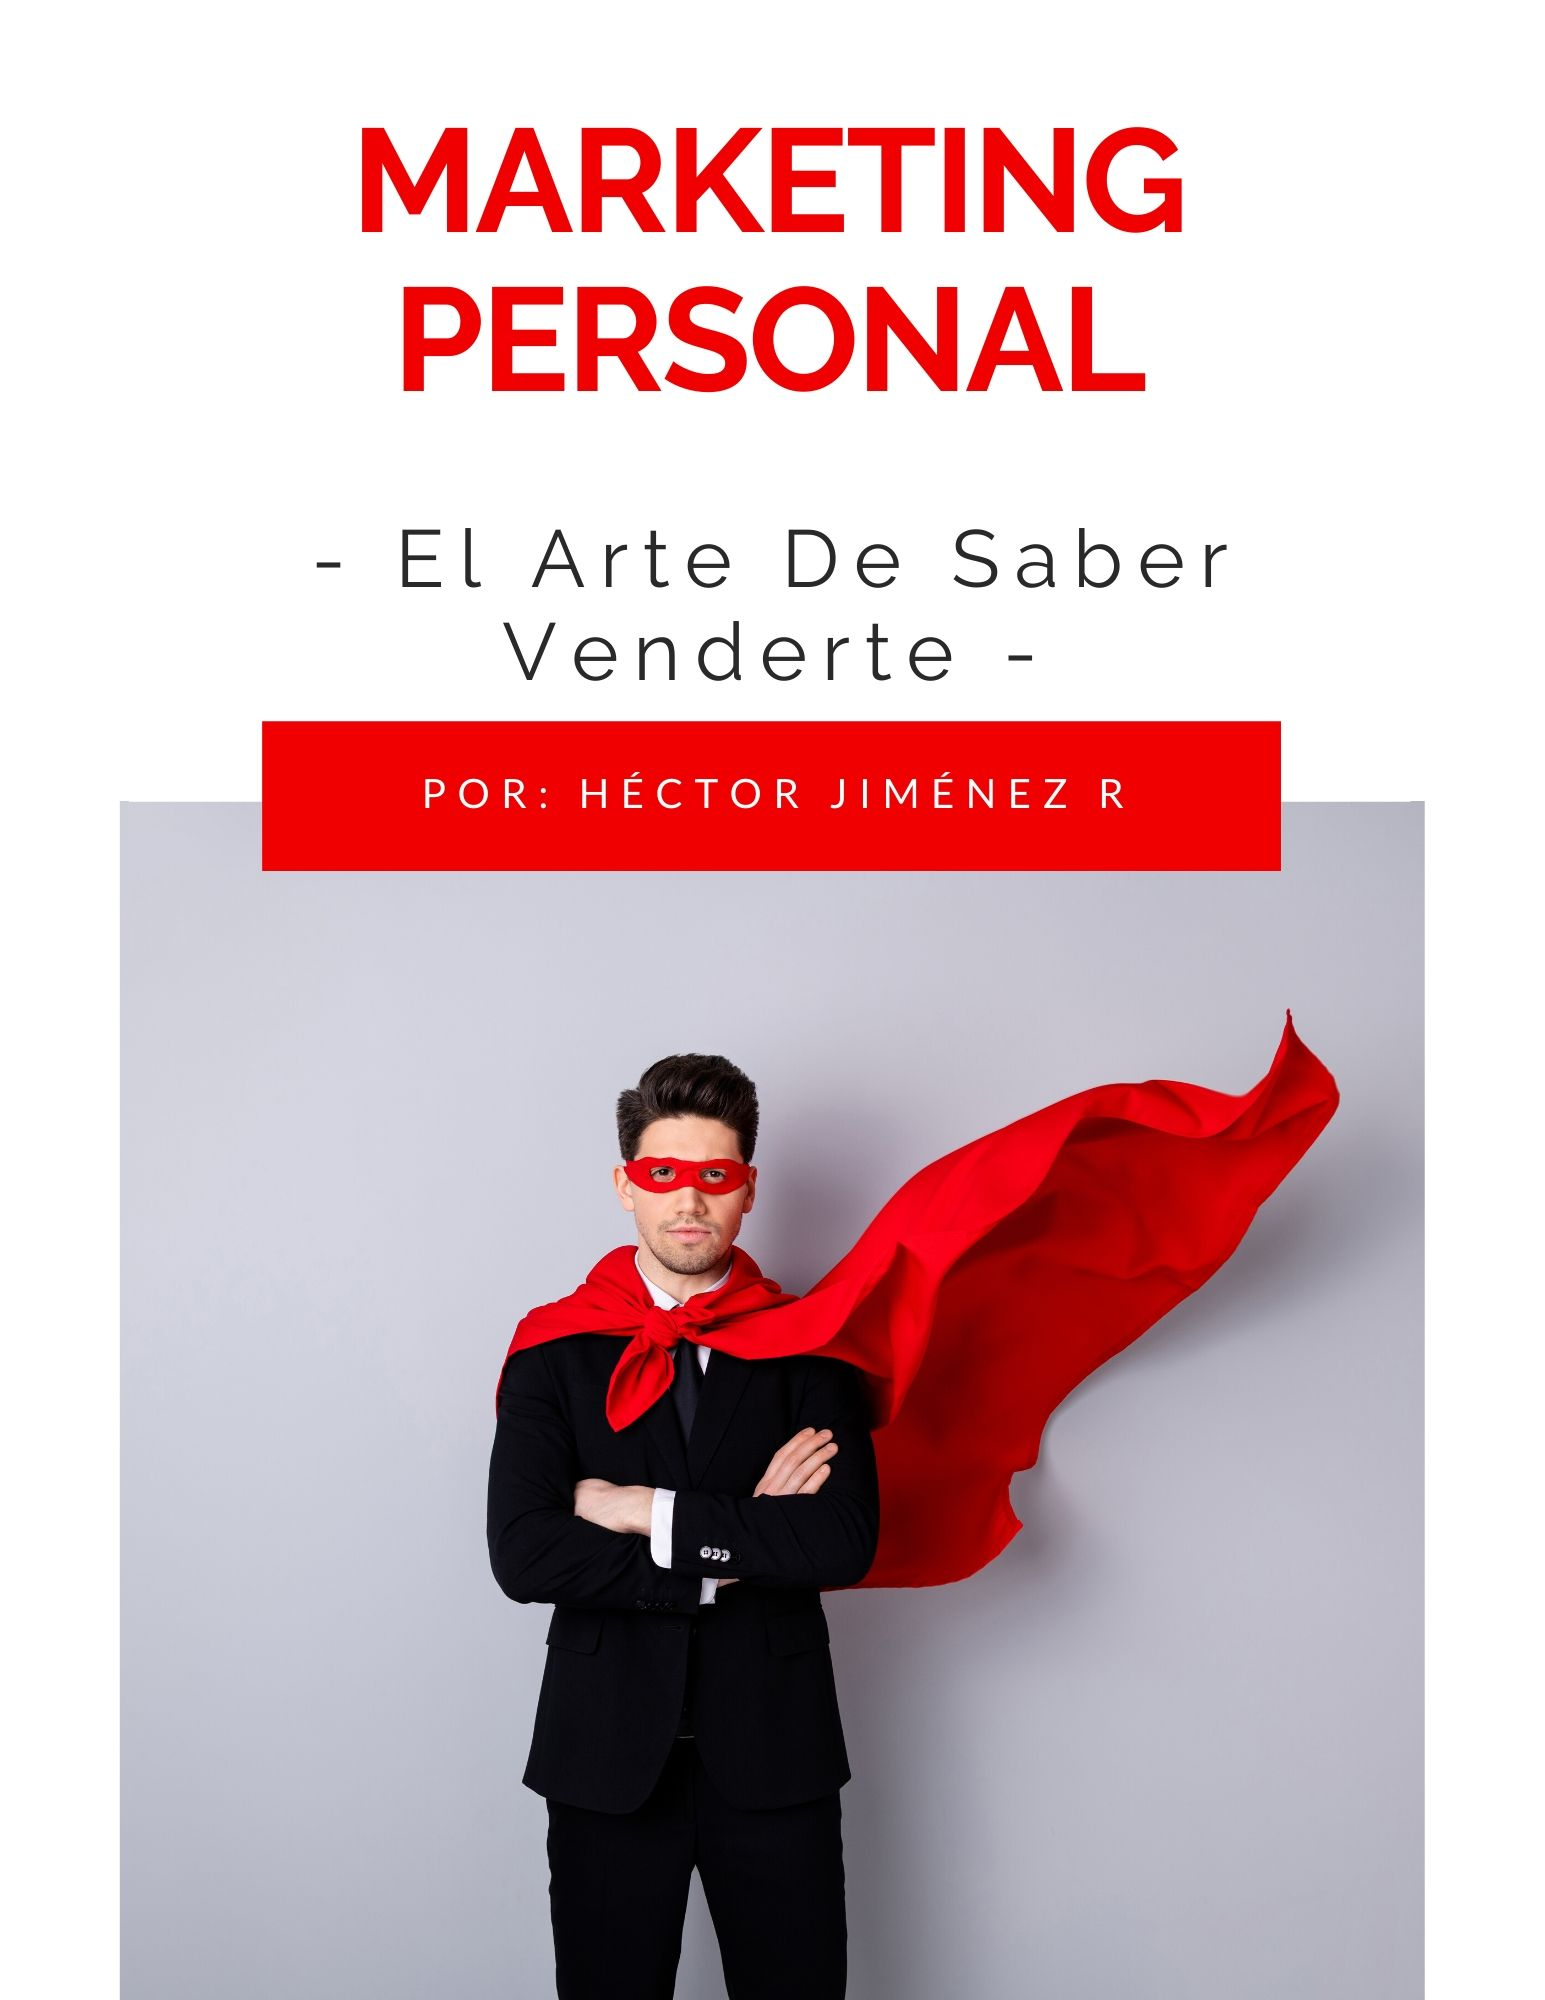 Hector Jimenez - 15 - Marketing Personal 2020